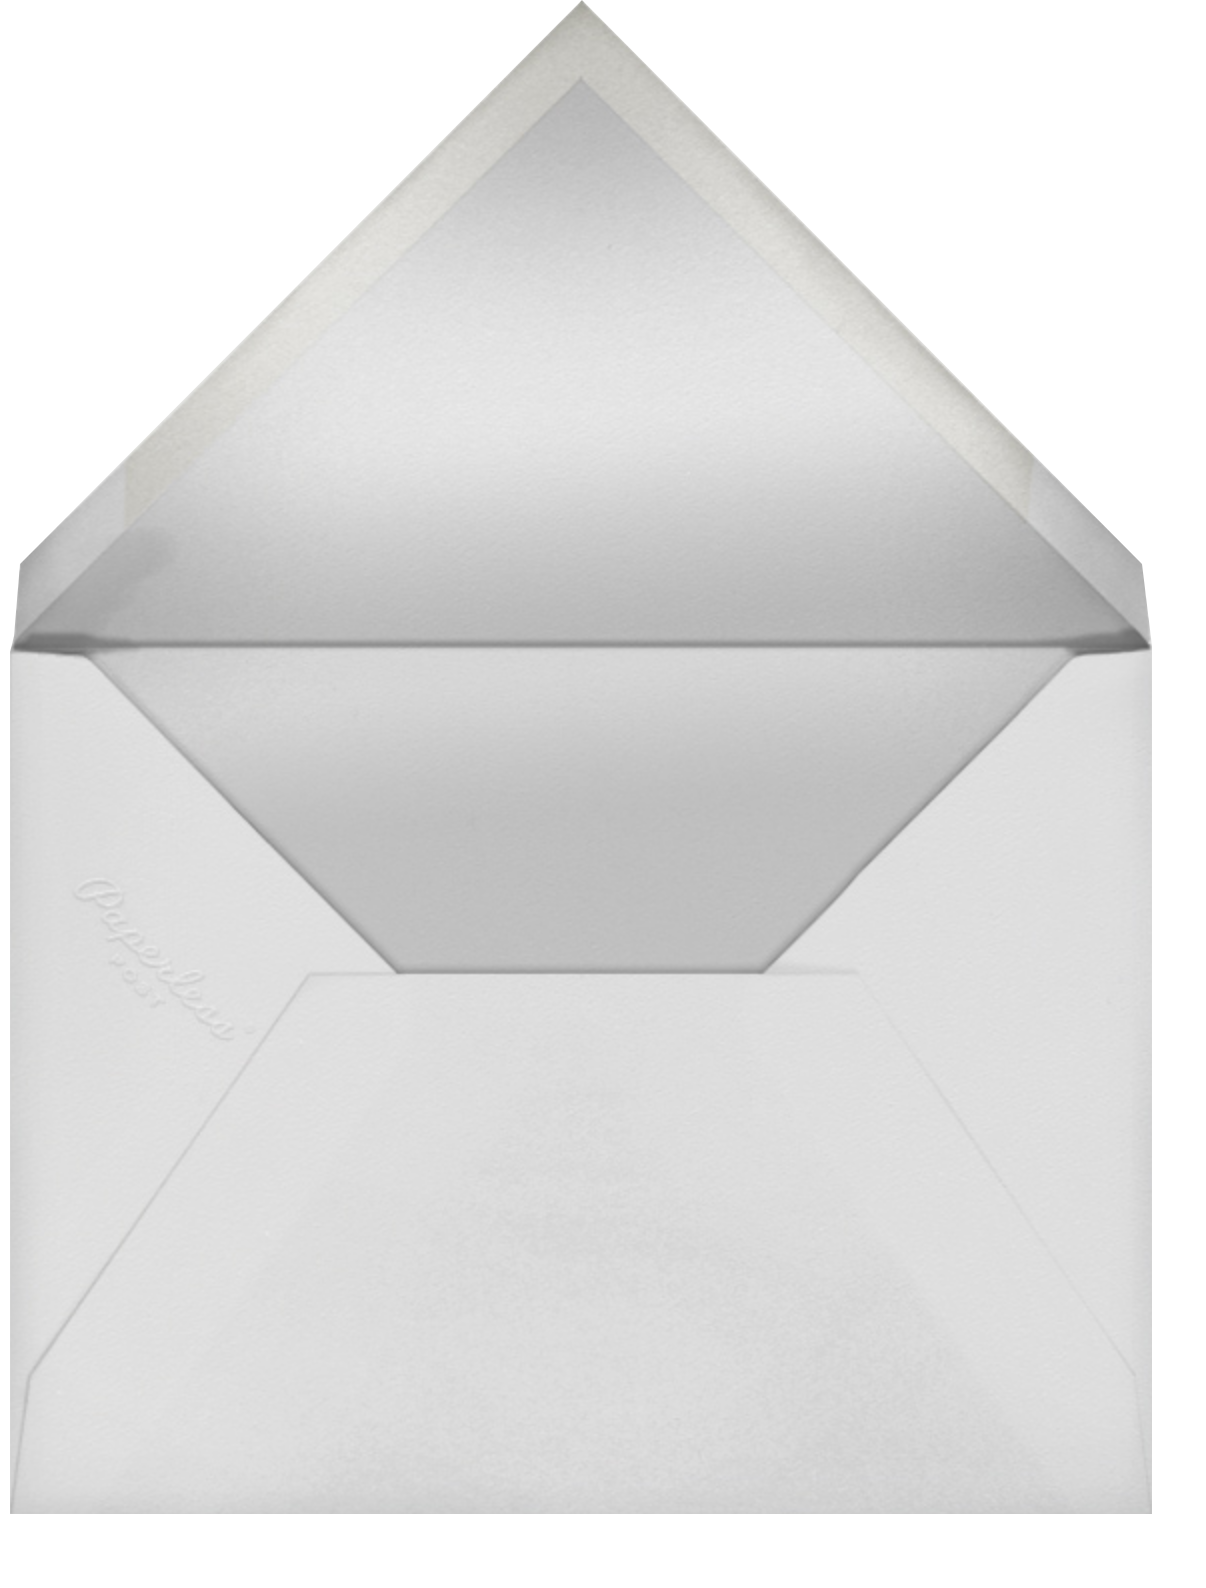 Lodden (Menu) - Pink - Liberty - Envelope